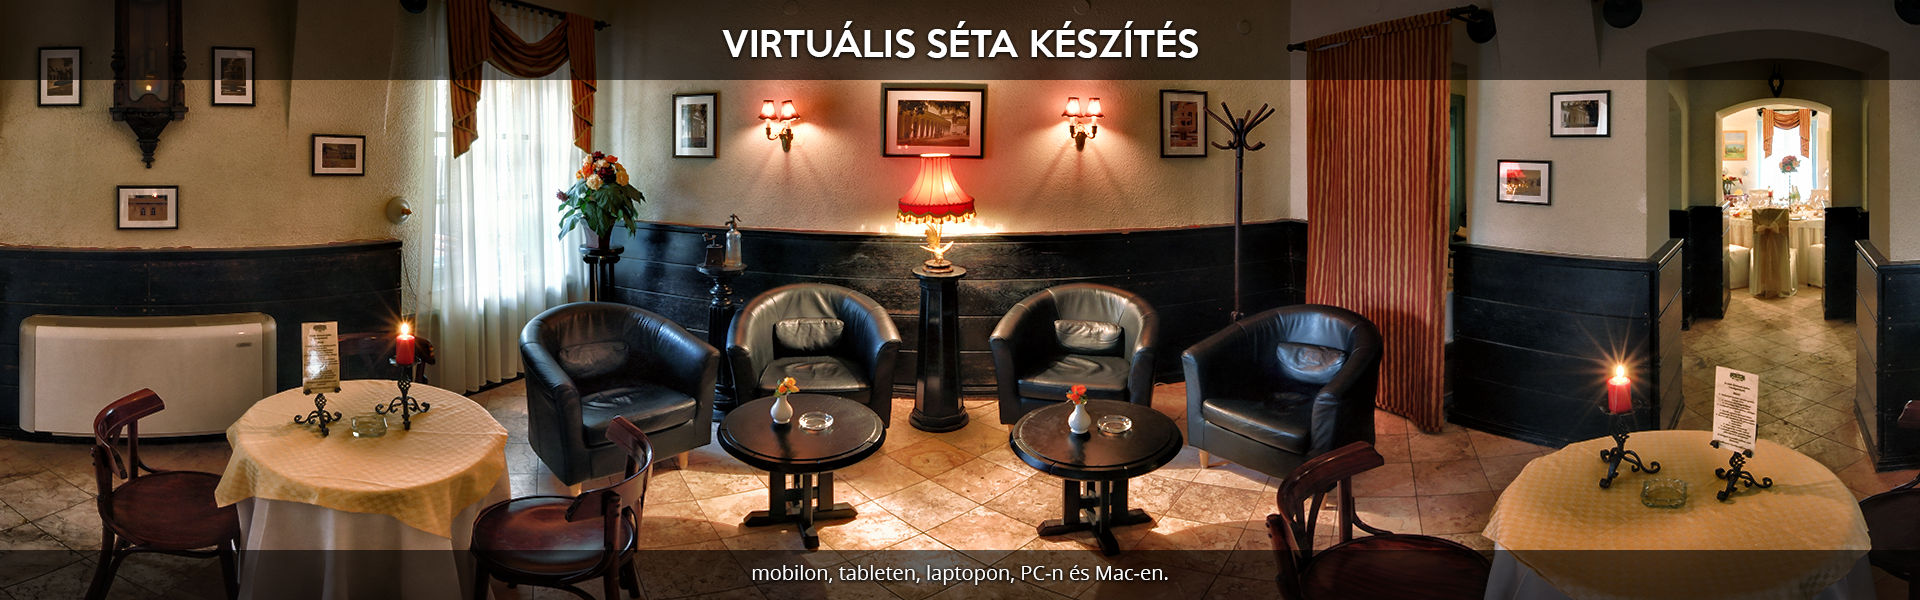 Virtuális séta